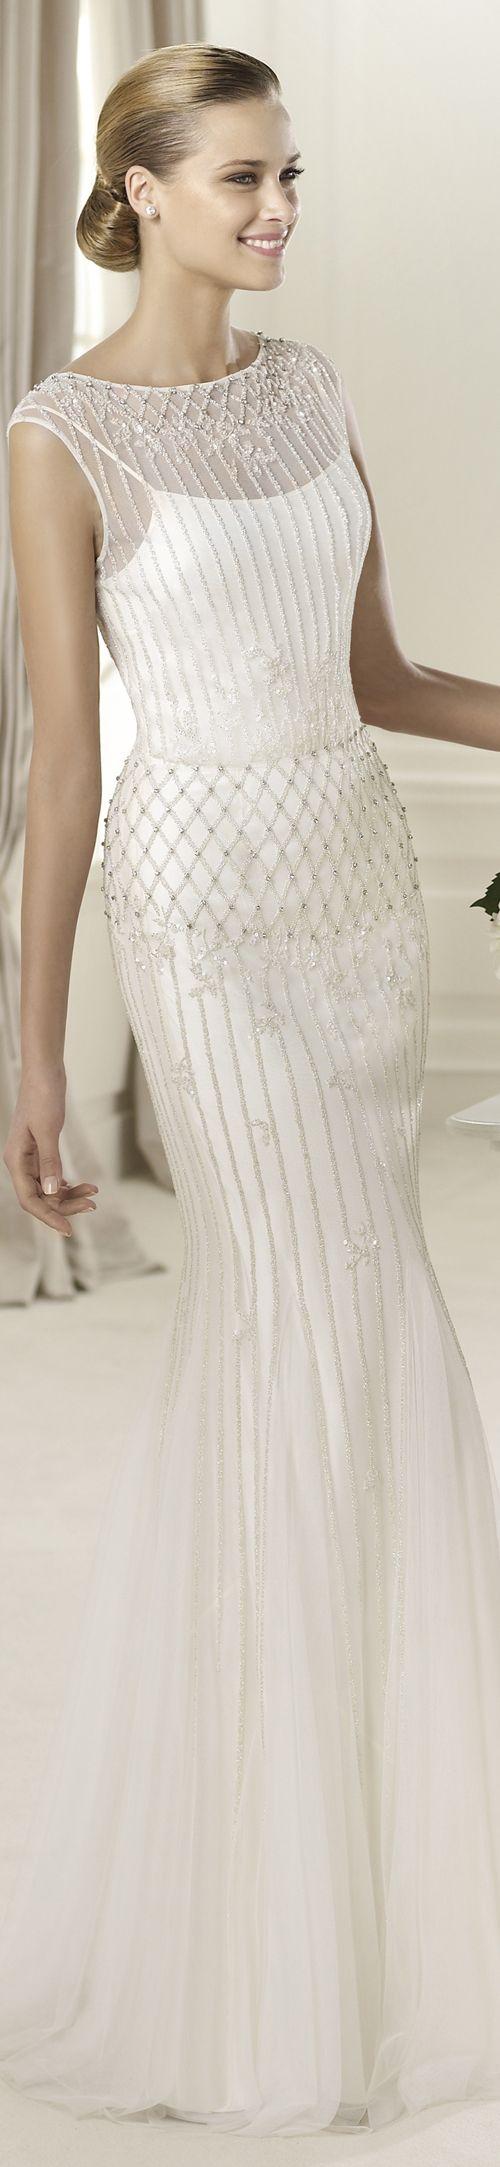 Pronovias Dress - - 2013 | Like a princess! | Pinterest | Dresses, Gowns and Wedding dresses